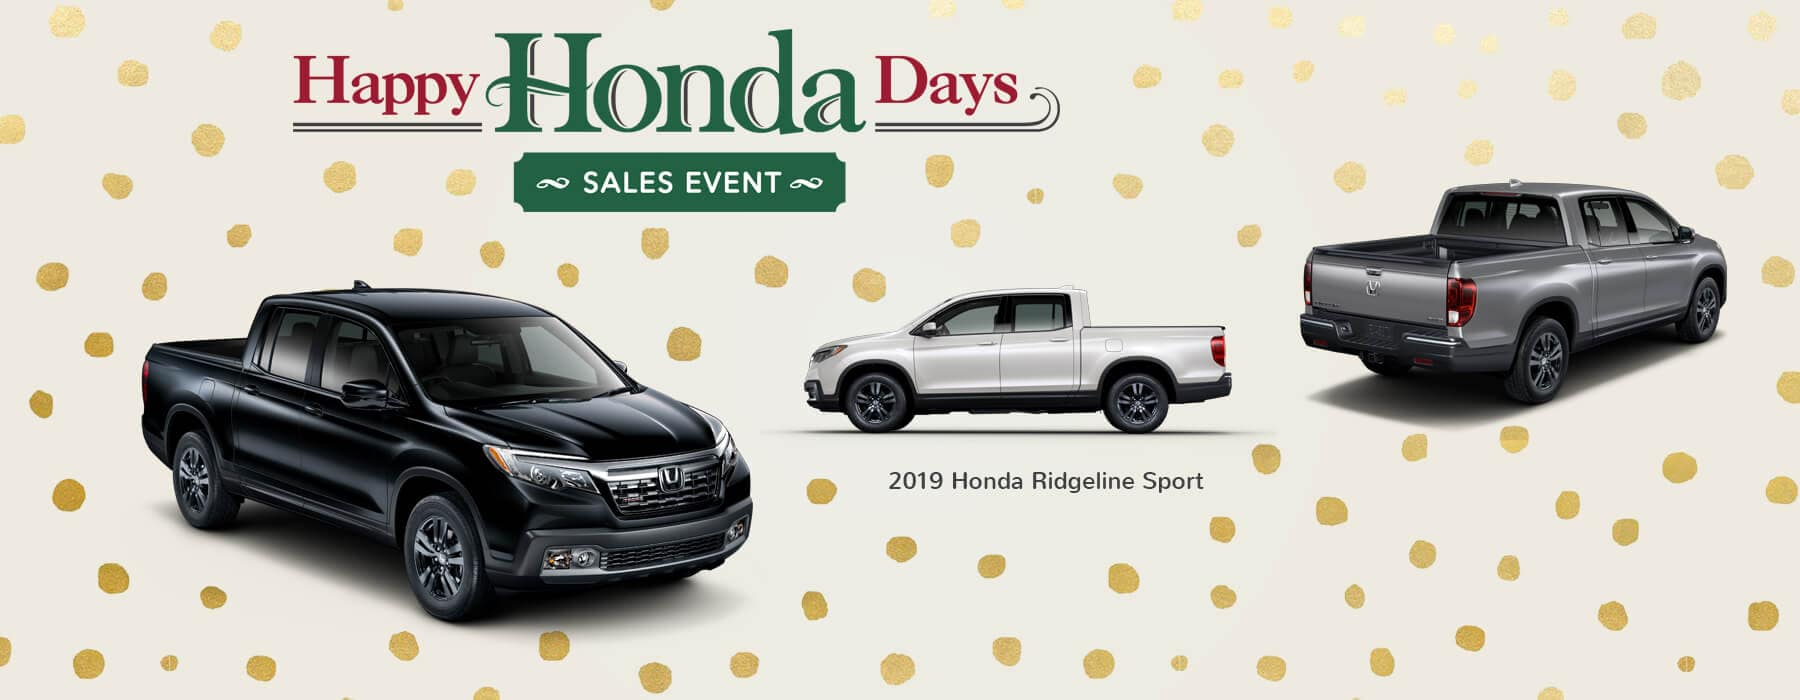 Happy Honda Days Sales Event 2019 Honda Ridgeline Slider